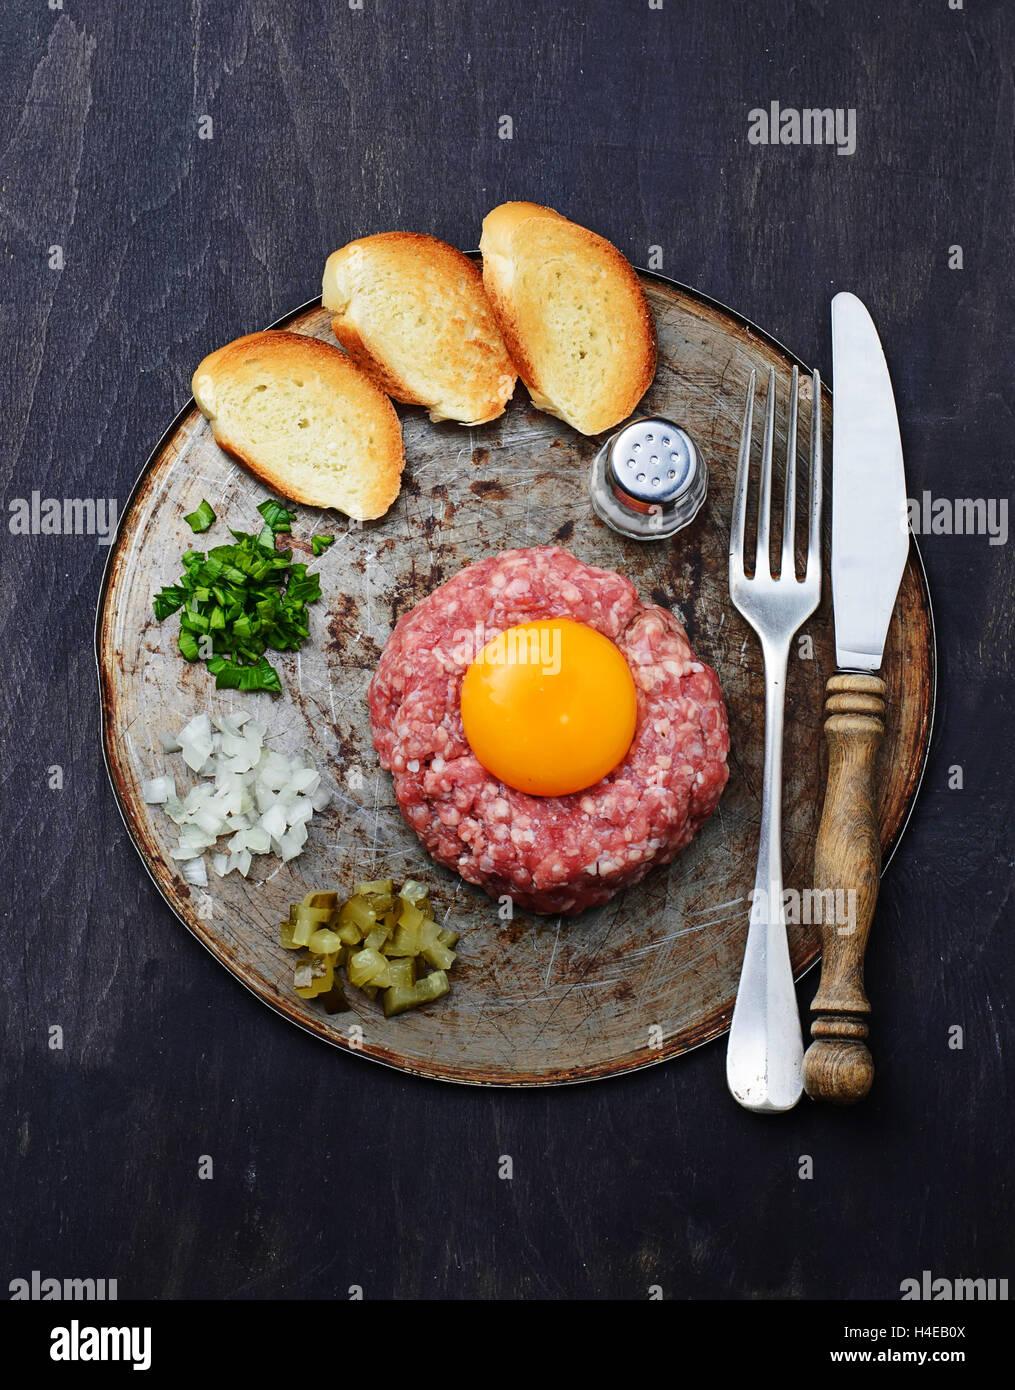 Tartare de boeuf frais avec l'oeuf, cornichon et l'oignon. Selective focus Photo Stock